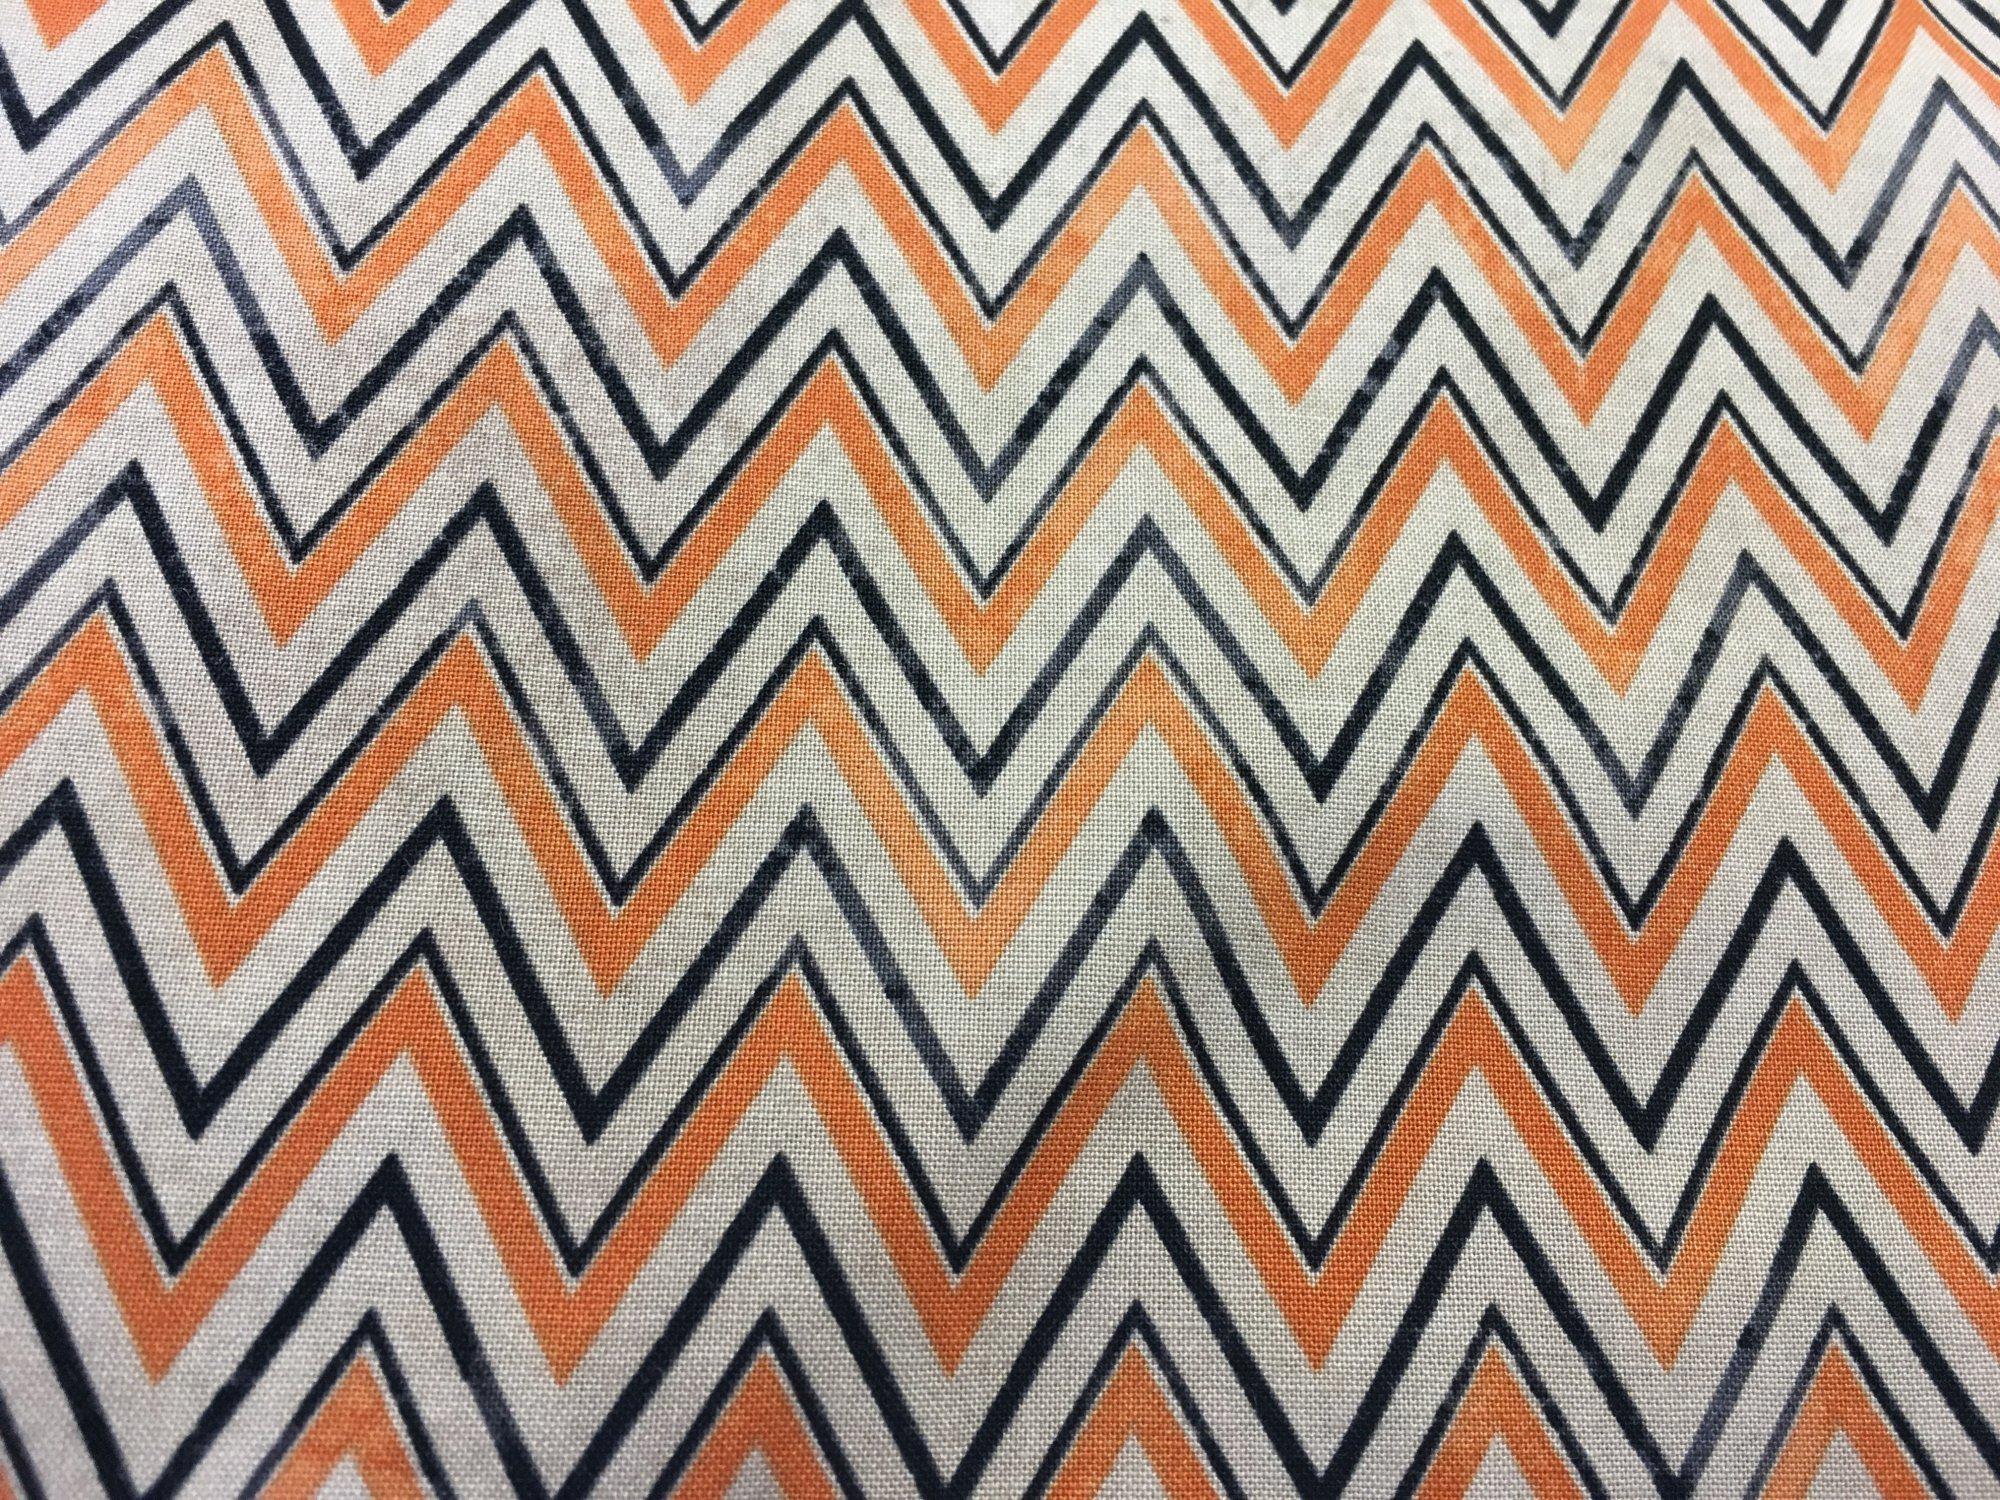 Materialize Zigzag Orange PWTH07980RAN Tim Holtz